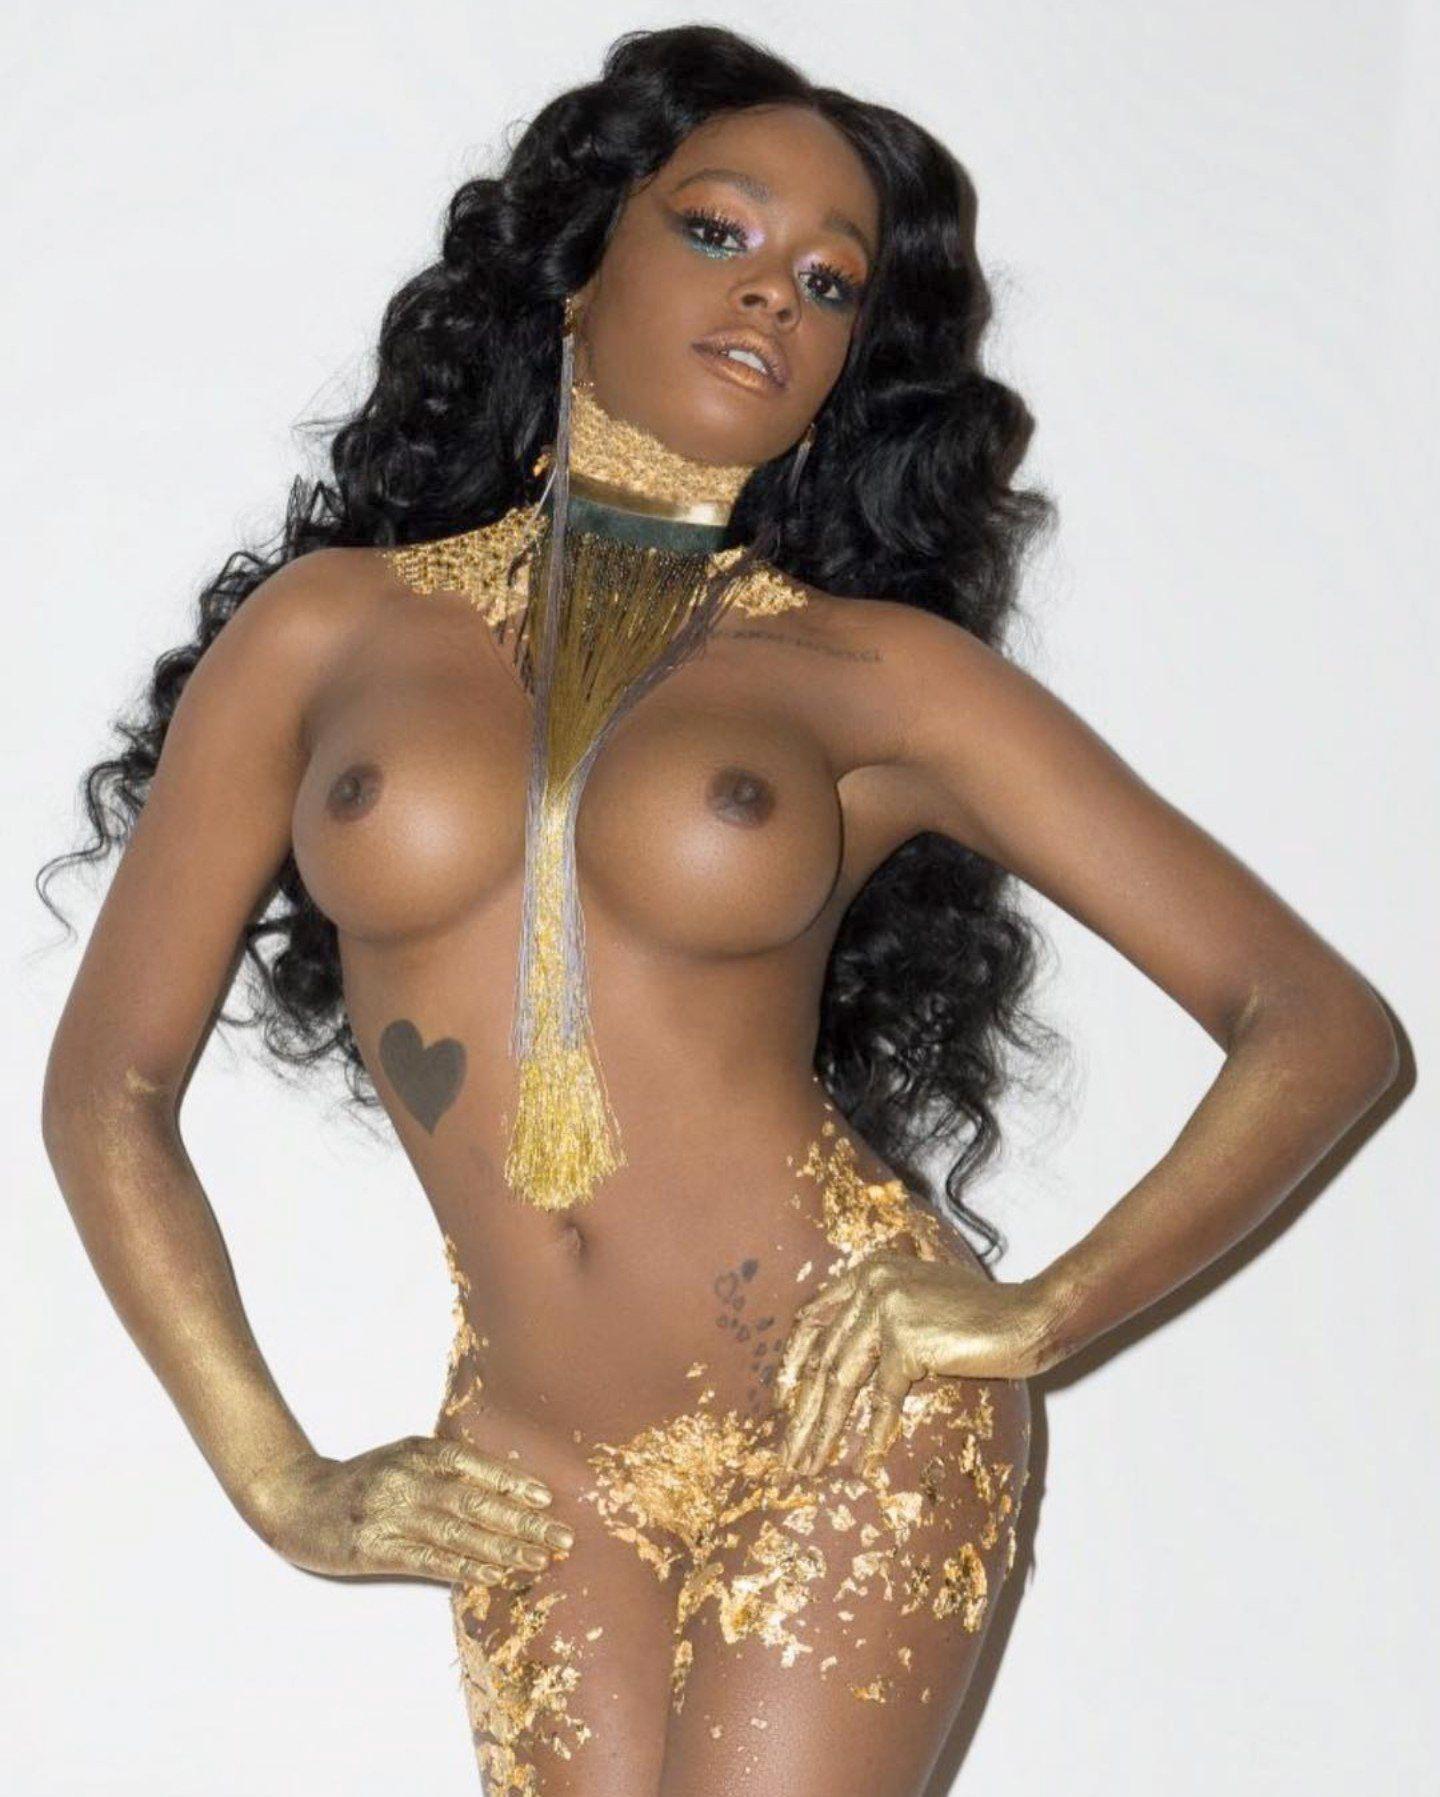 lutz florida girls naked